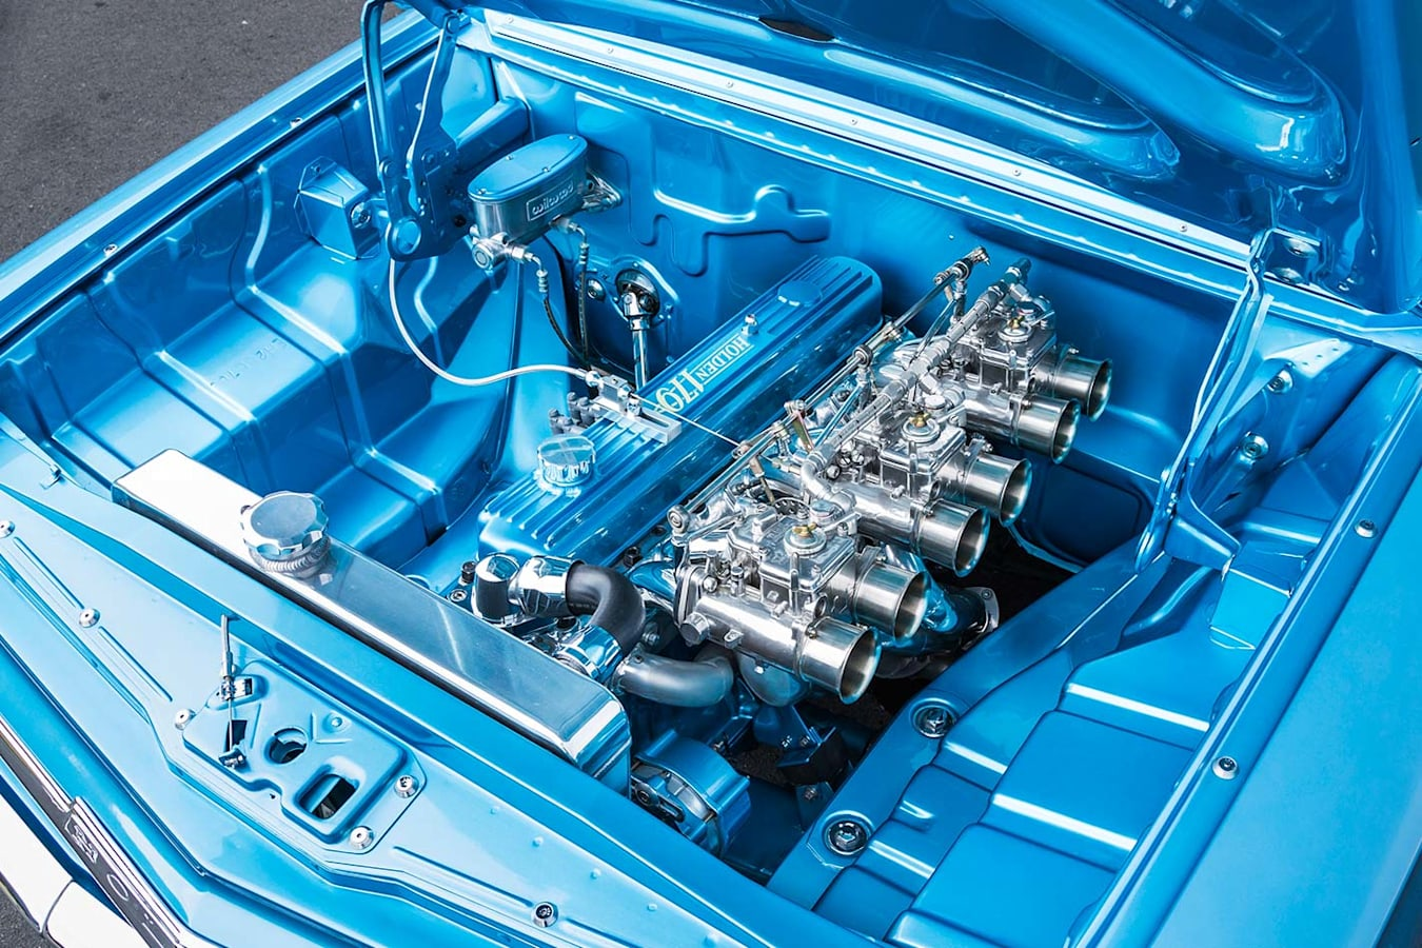 Holden EH wagon engine bay